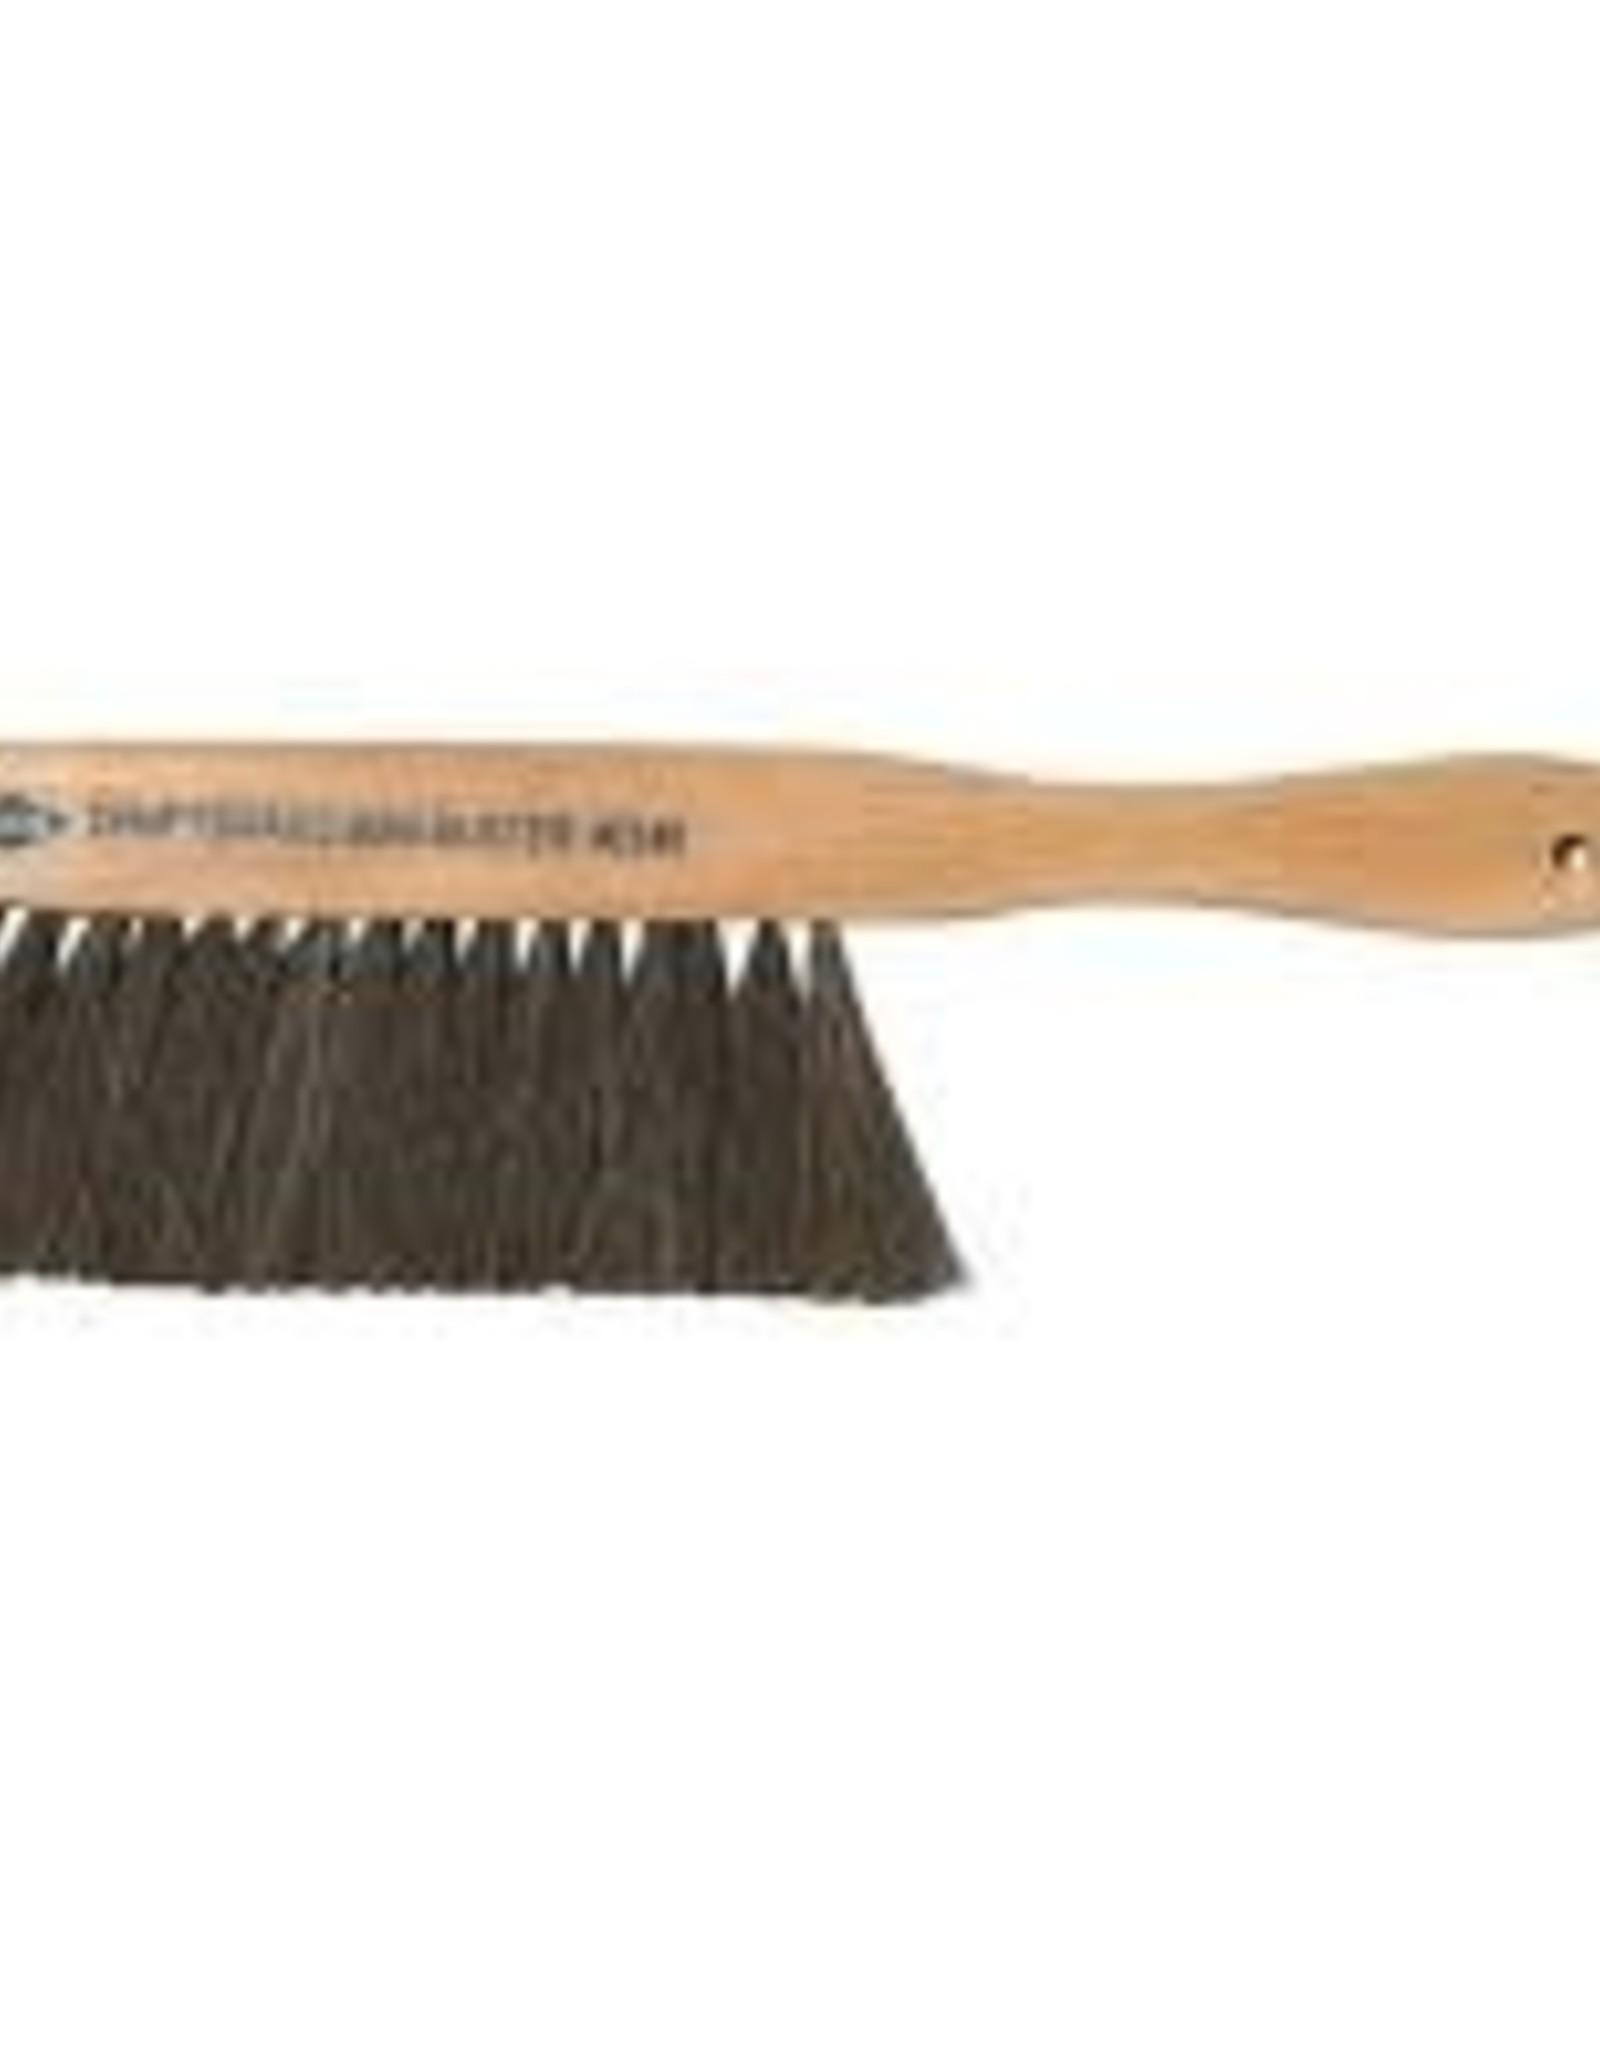 Alvin  Mini Dusting Brush